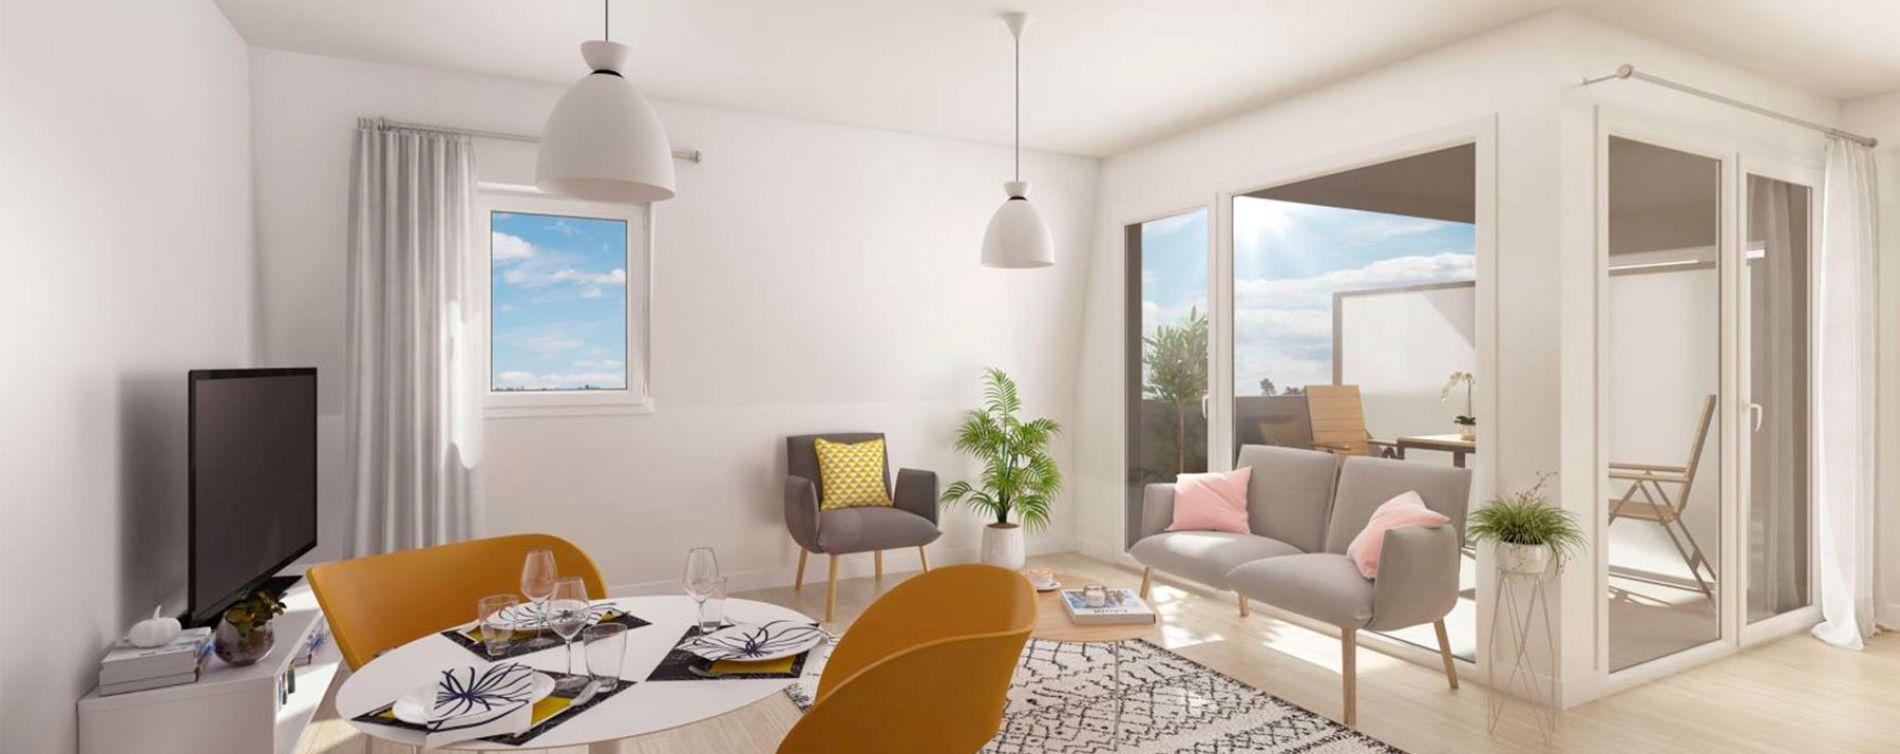 Tarbes : programme immobilier neuve « Oh! Activ' » (3)